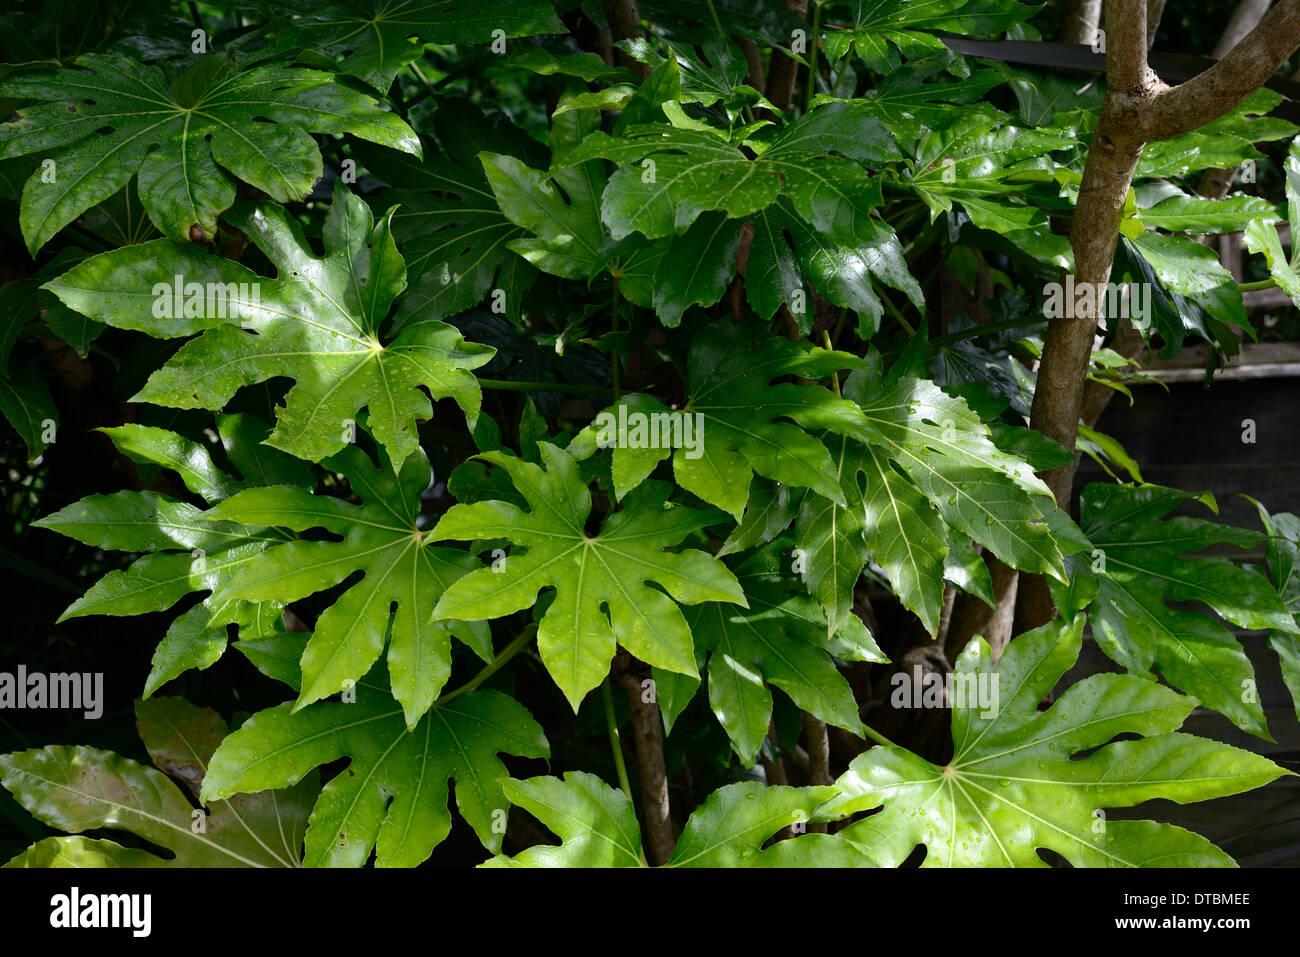 Fatsia Japonica grüne Laub Blätter Pflanzenportraits immergrüne